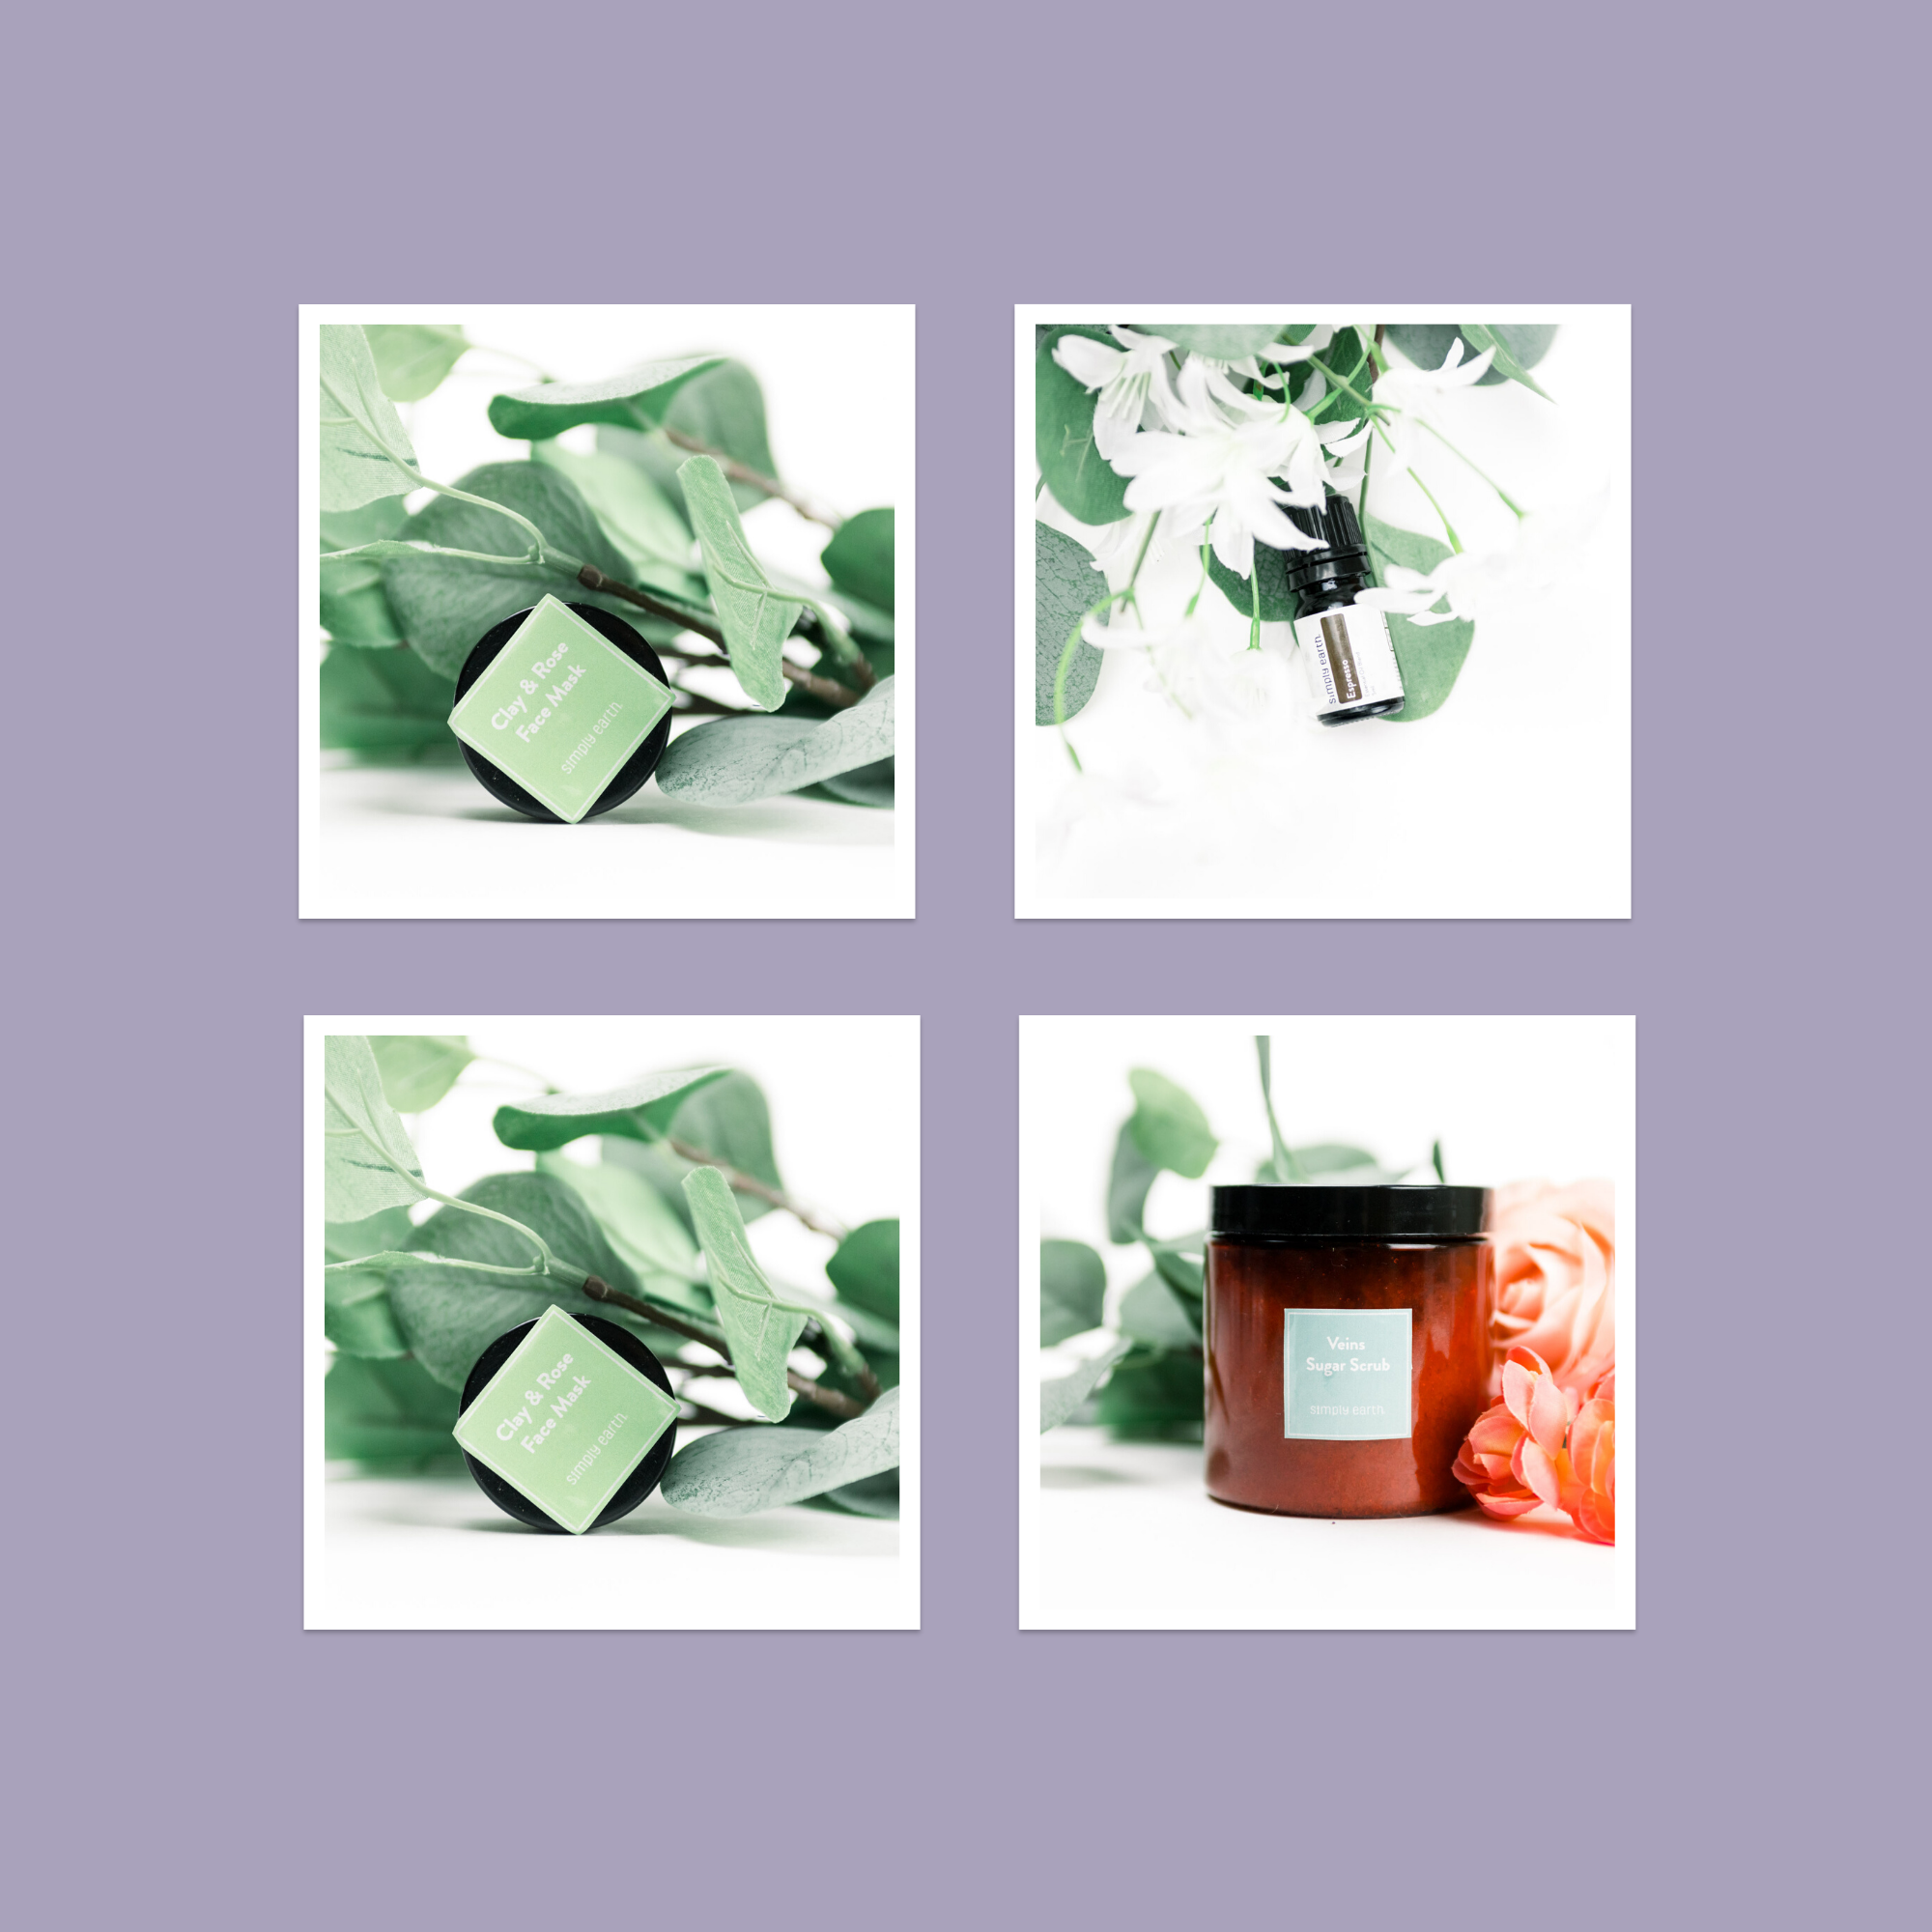 February 2020 Simply Earth Essential Oil Recipe Box